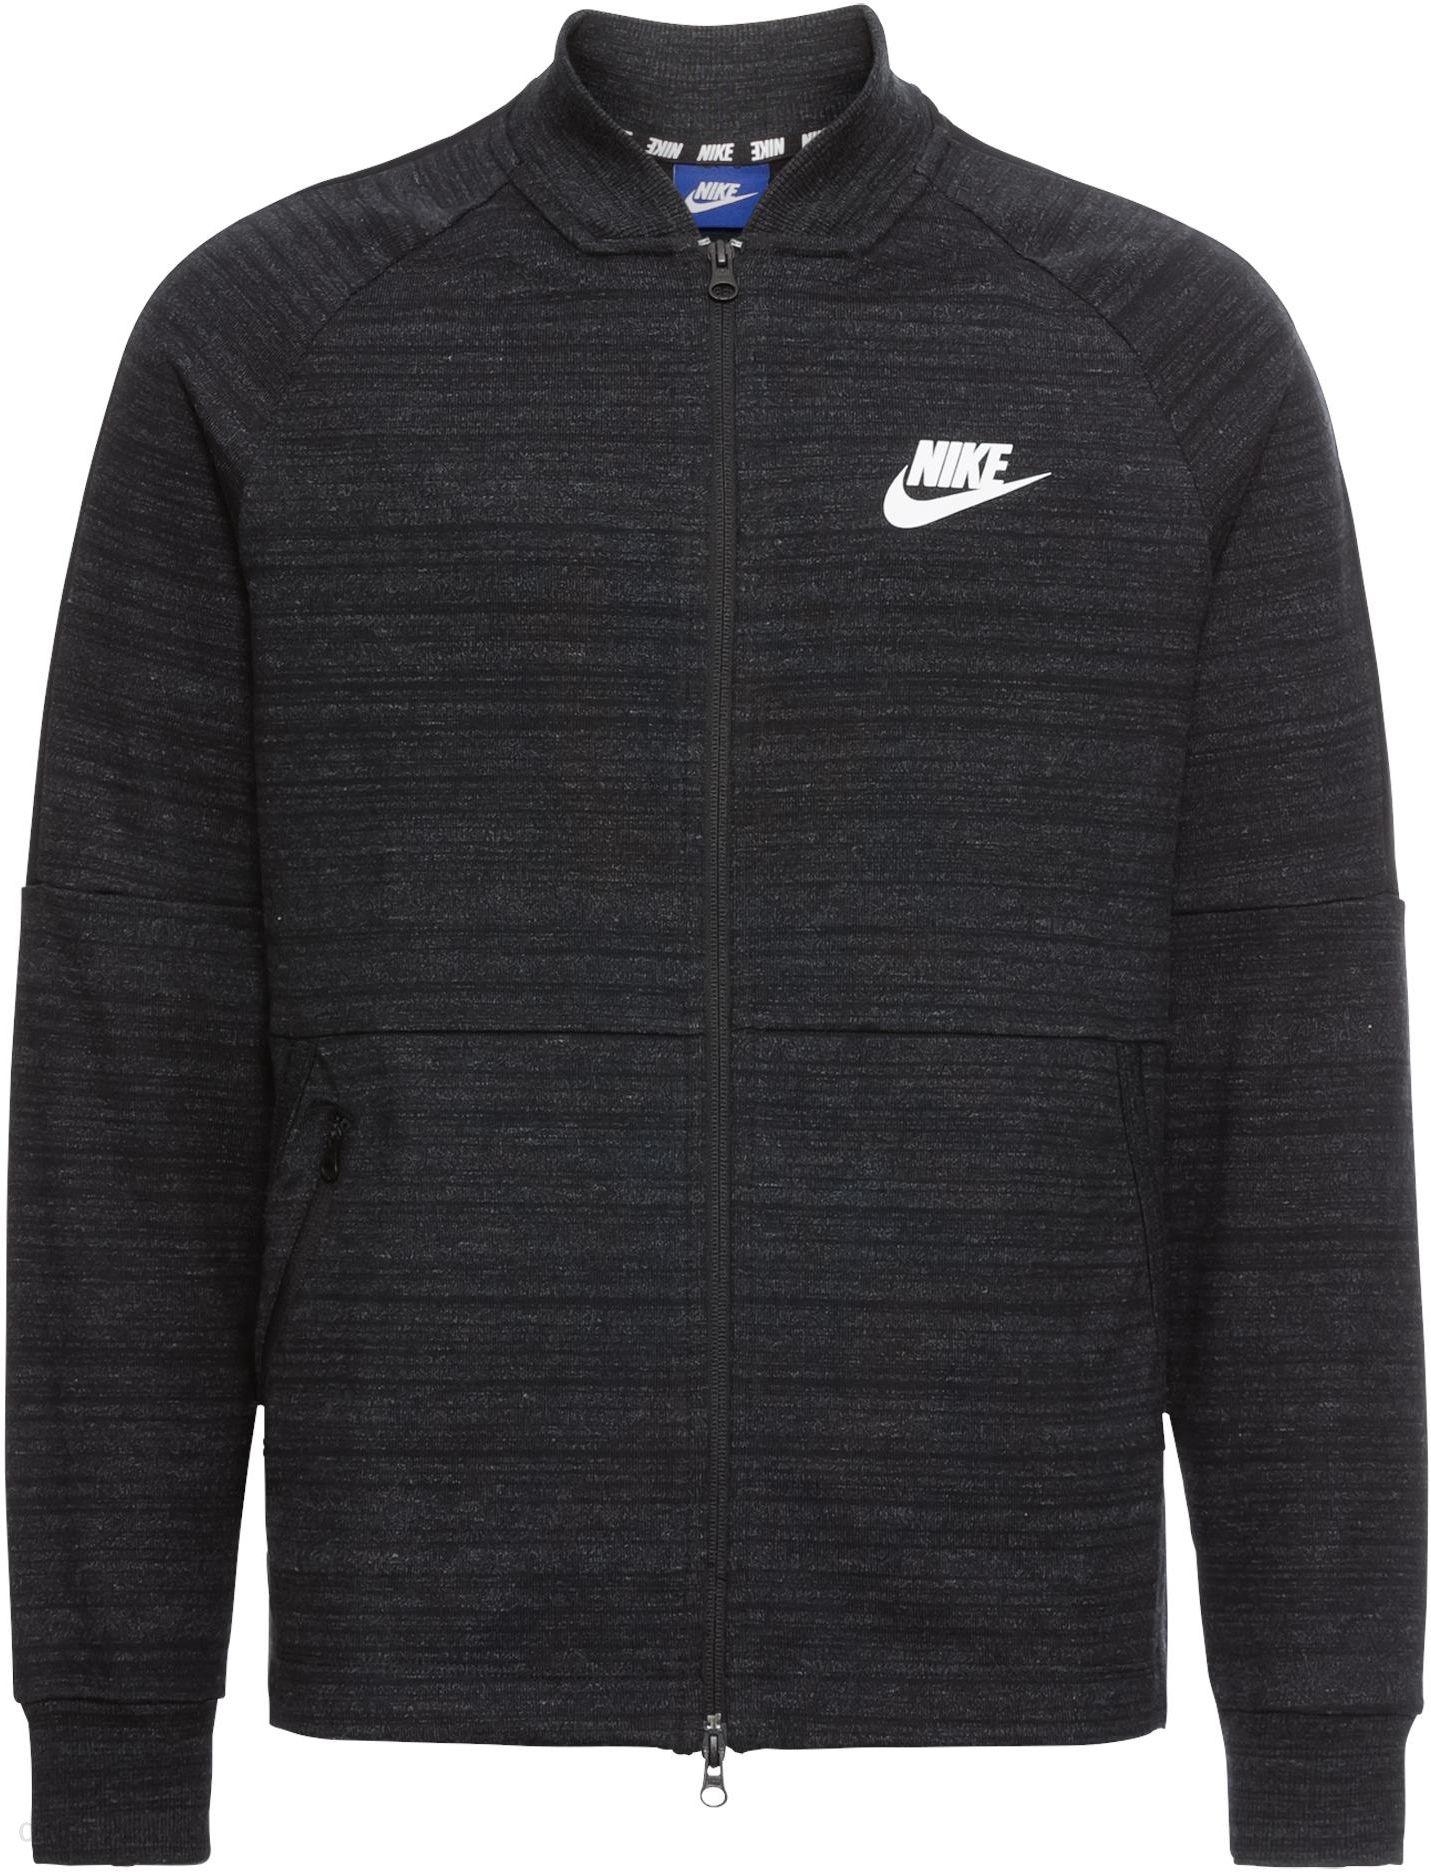 Kurtka Nike Sportswear AV15 Knit Jacket Czarny